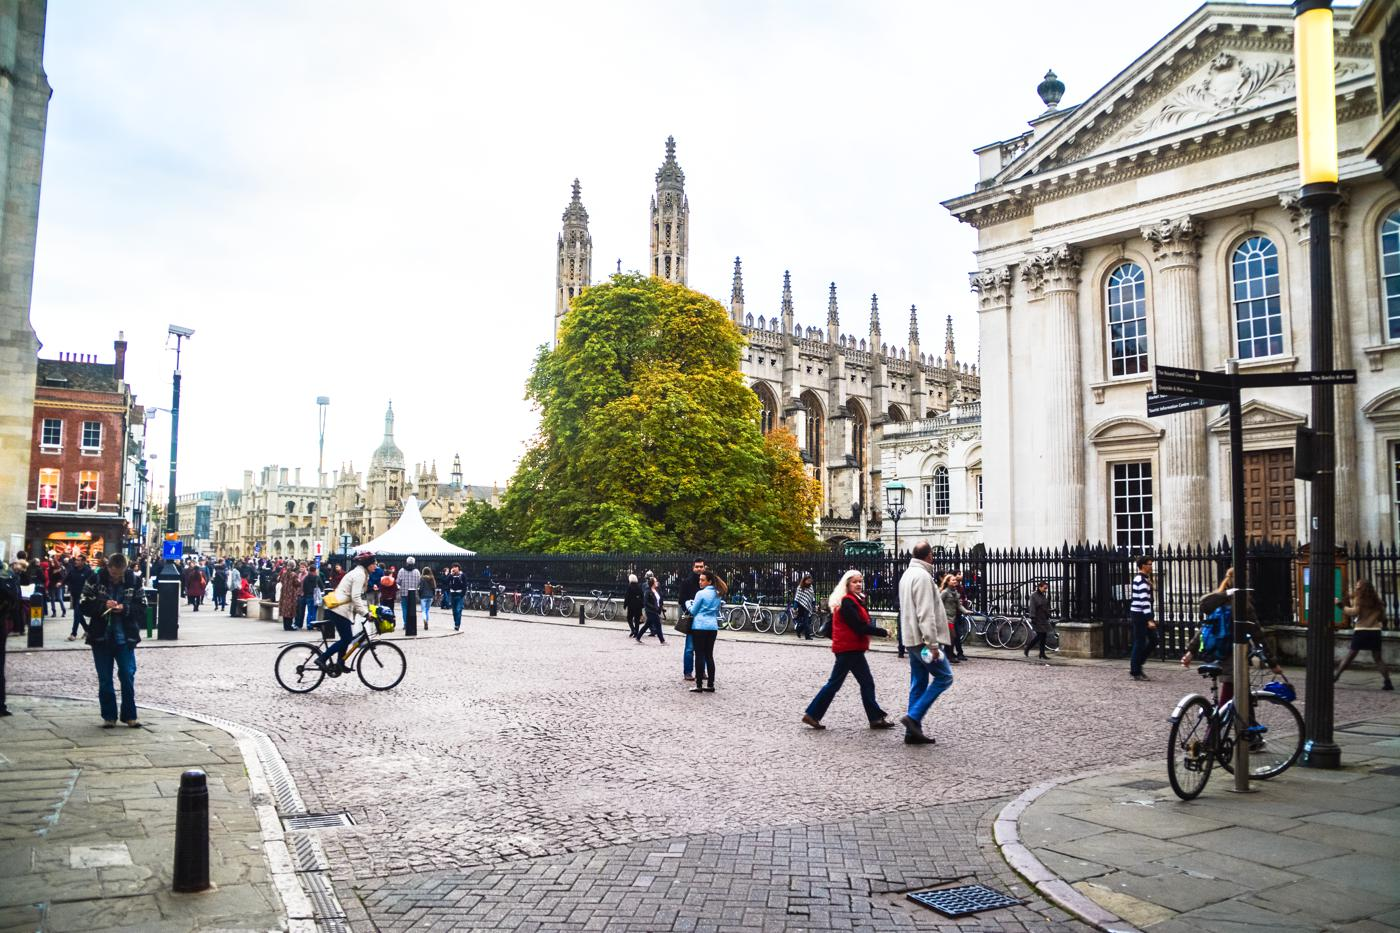 The University of Cambridge, Graduation, Senate House, Cambridge, England (13)